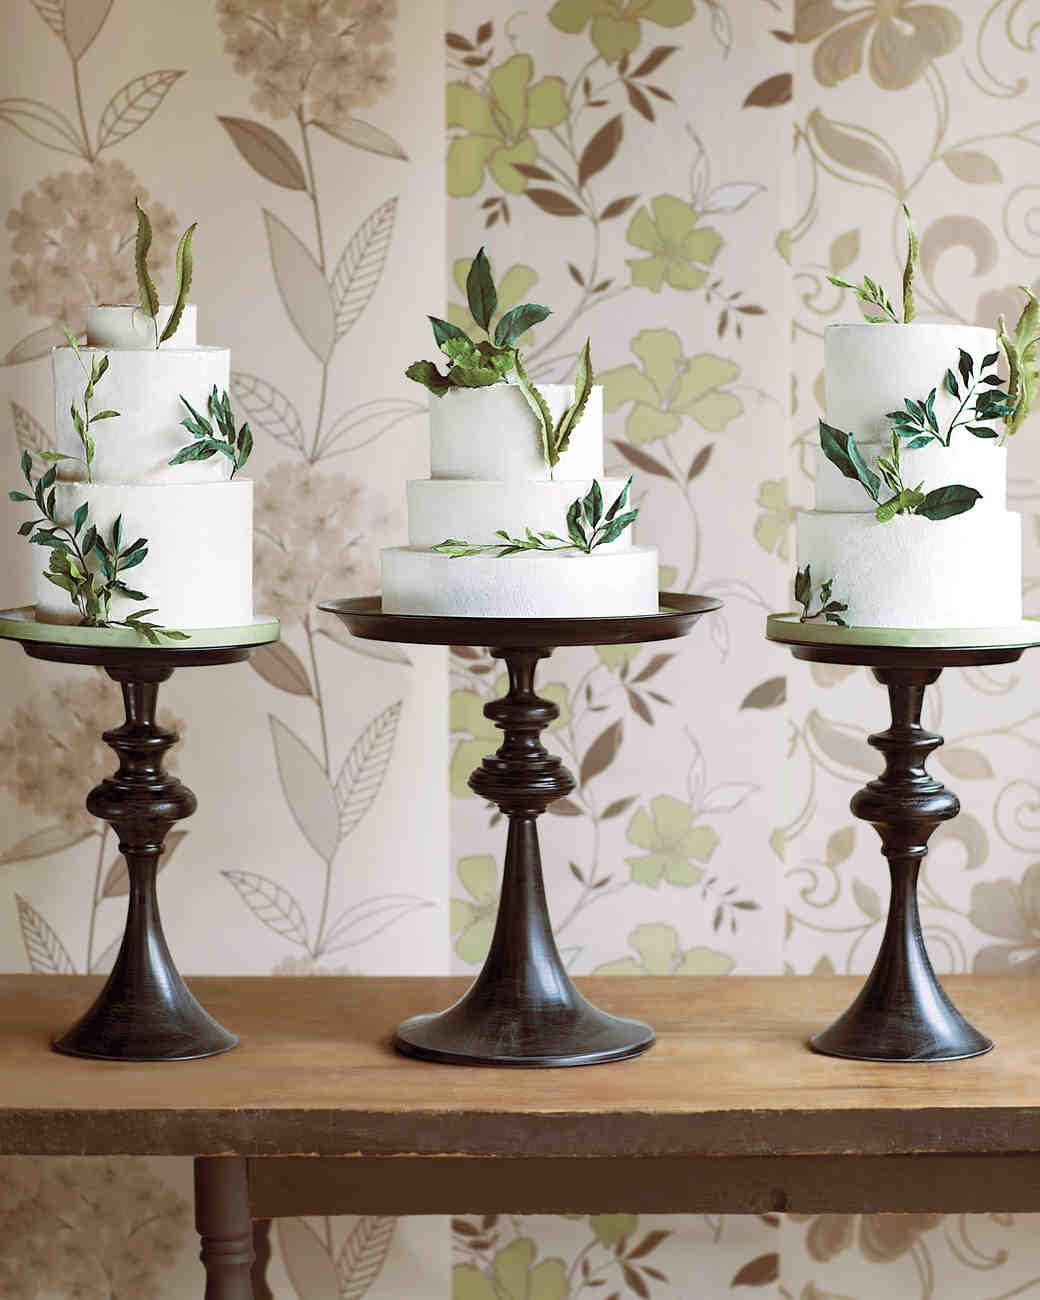 matthew-jack-cakes-0202-mwd109591.jpg